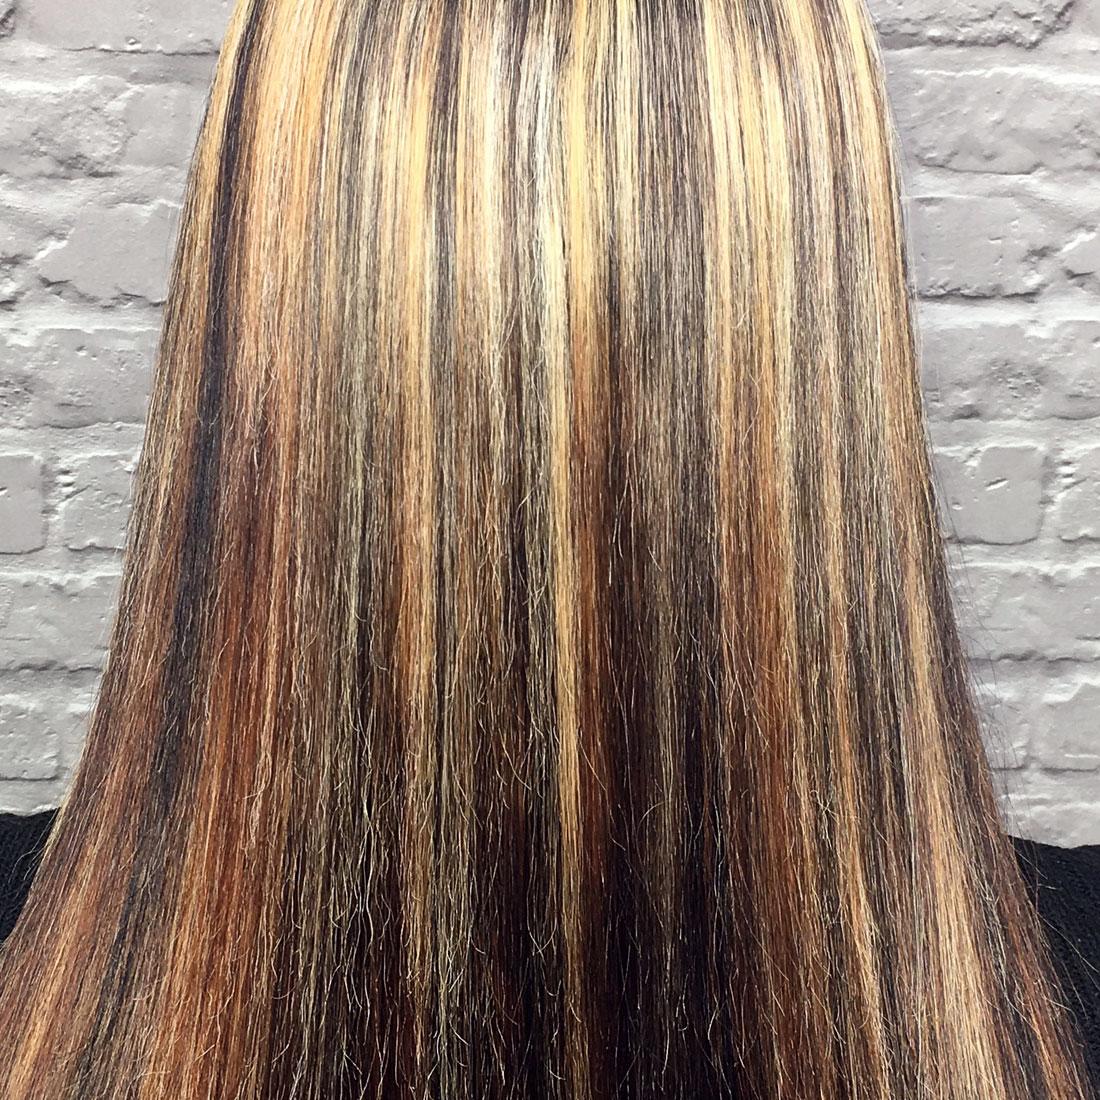 GK Keratin Hair Treatment After